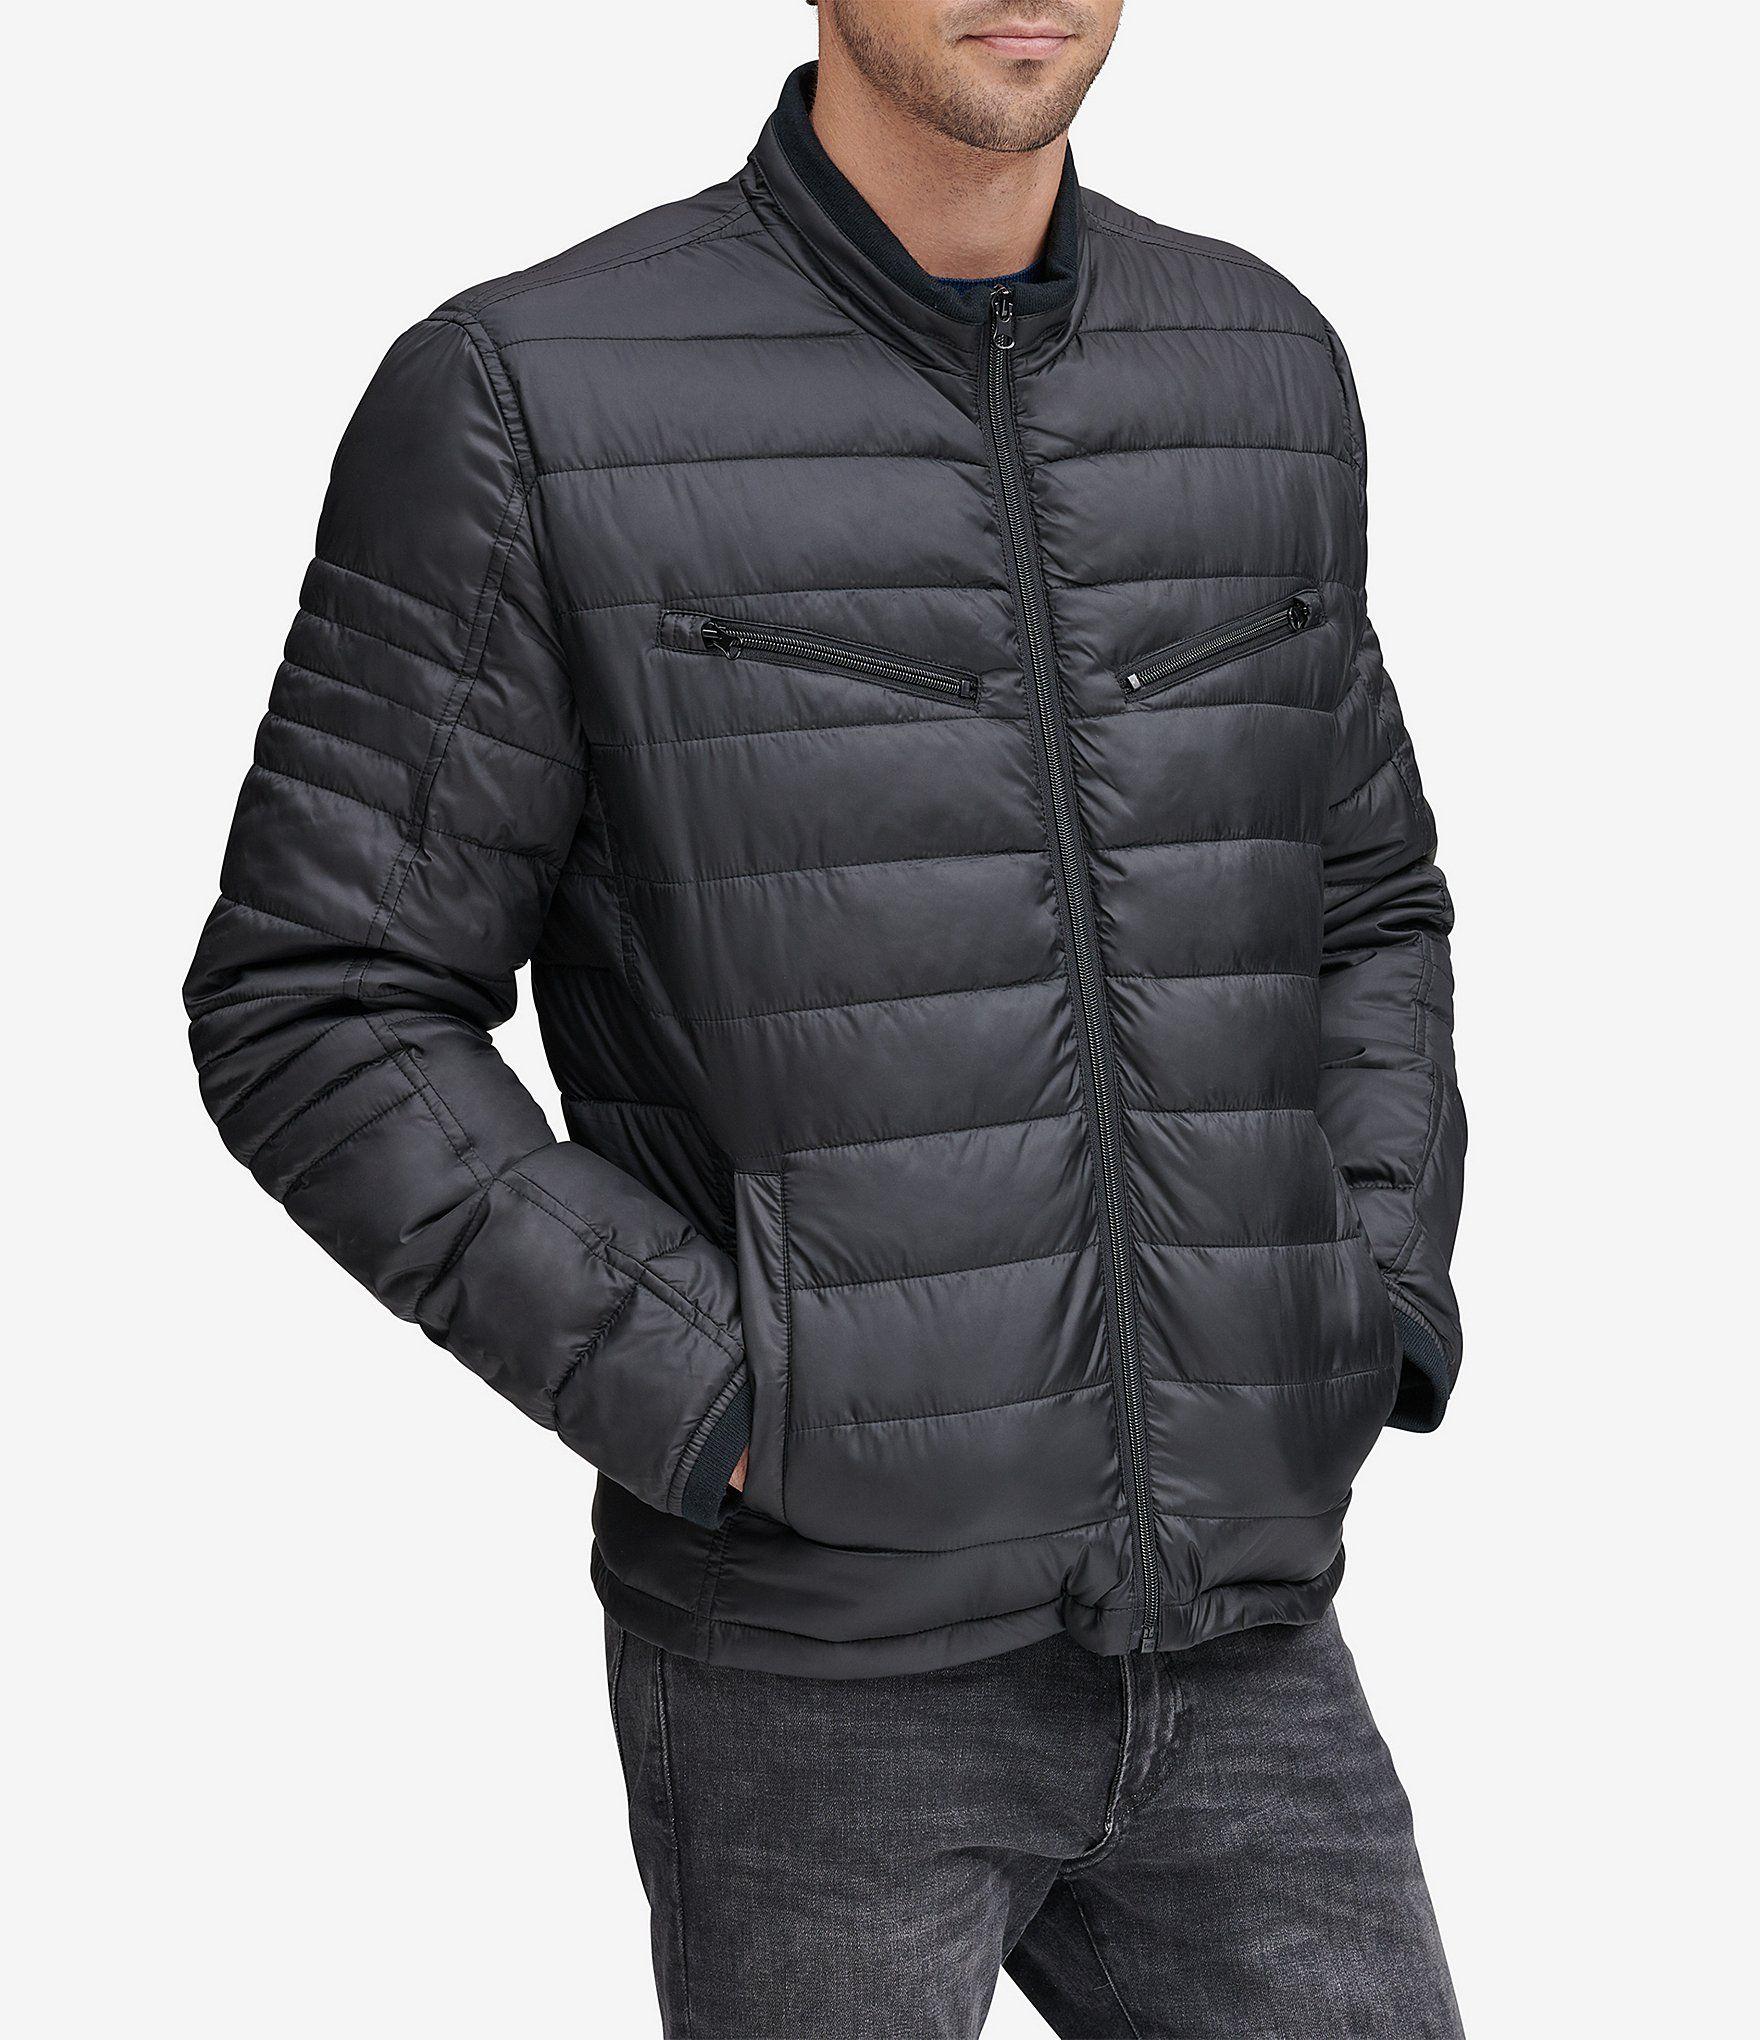 Marc New York Grymes Long Sleeve Puffer Jacket Dillard S New York Mens Marc New York Mens Jackets [ 2040 x 1760 Pixel ]